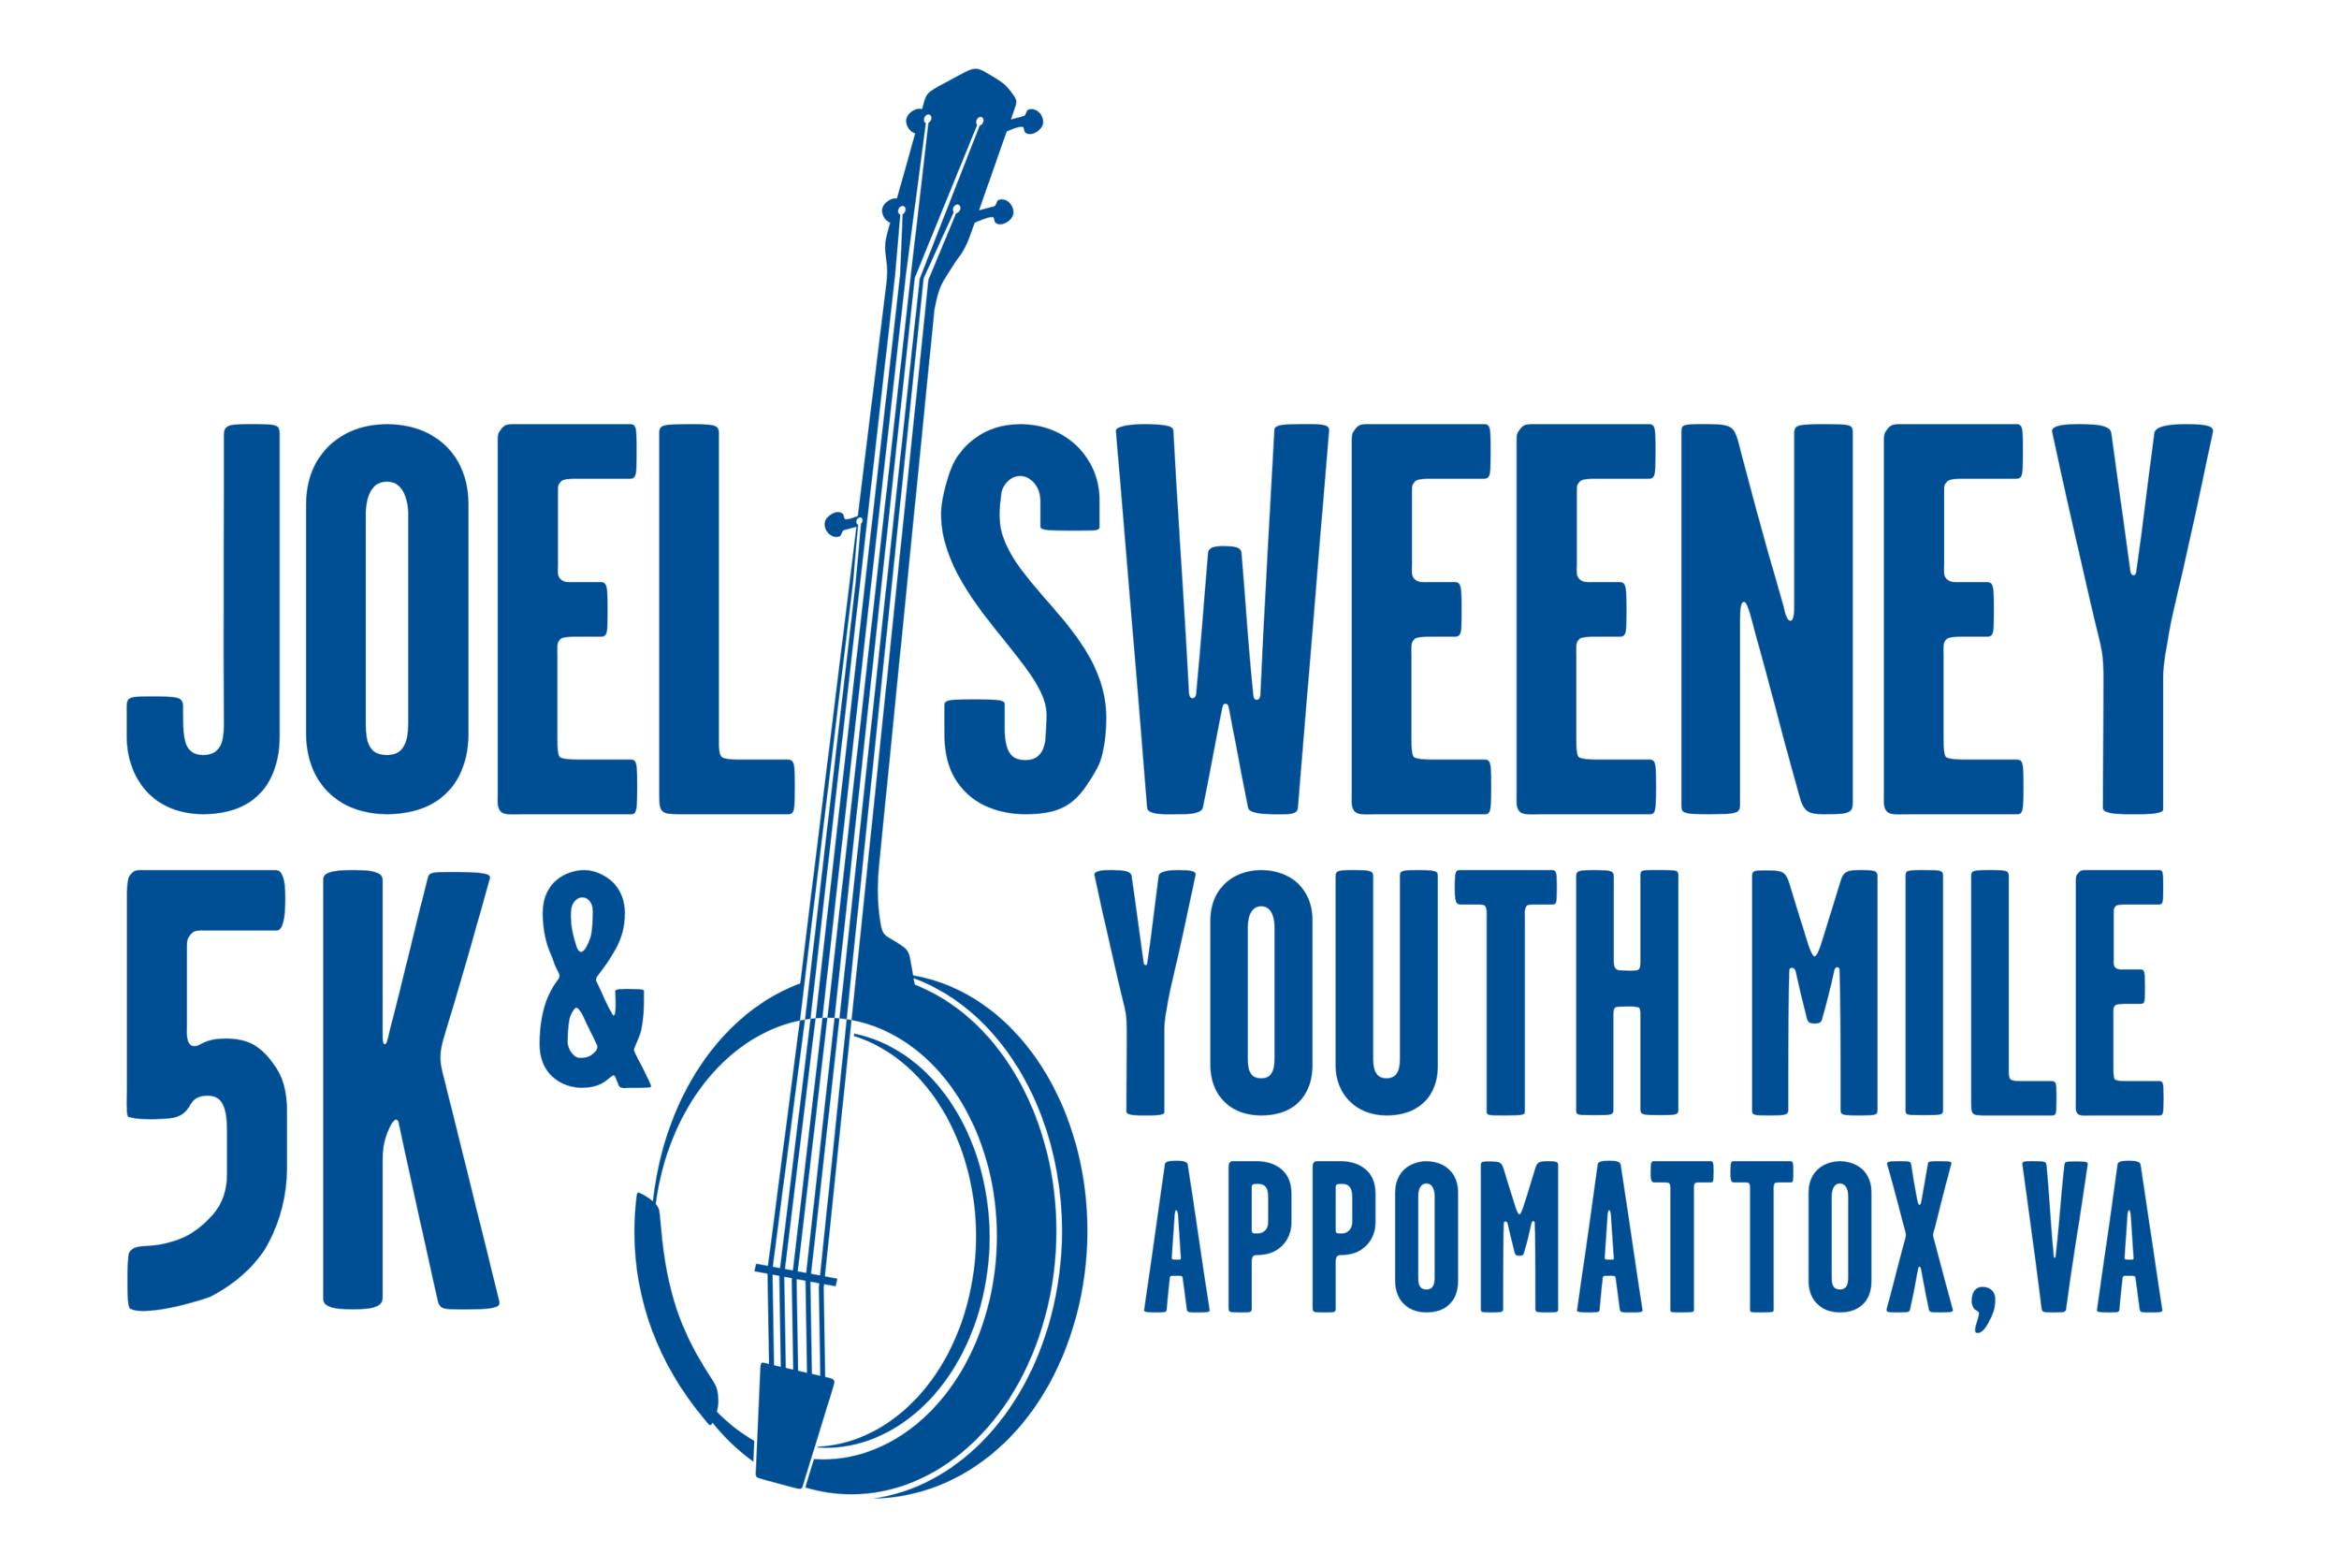 Joel Sweeney 5k & Youth Mile - Saturday, October 6Appomattox, VA